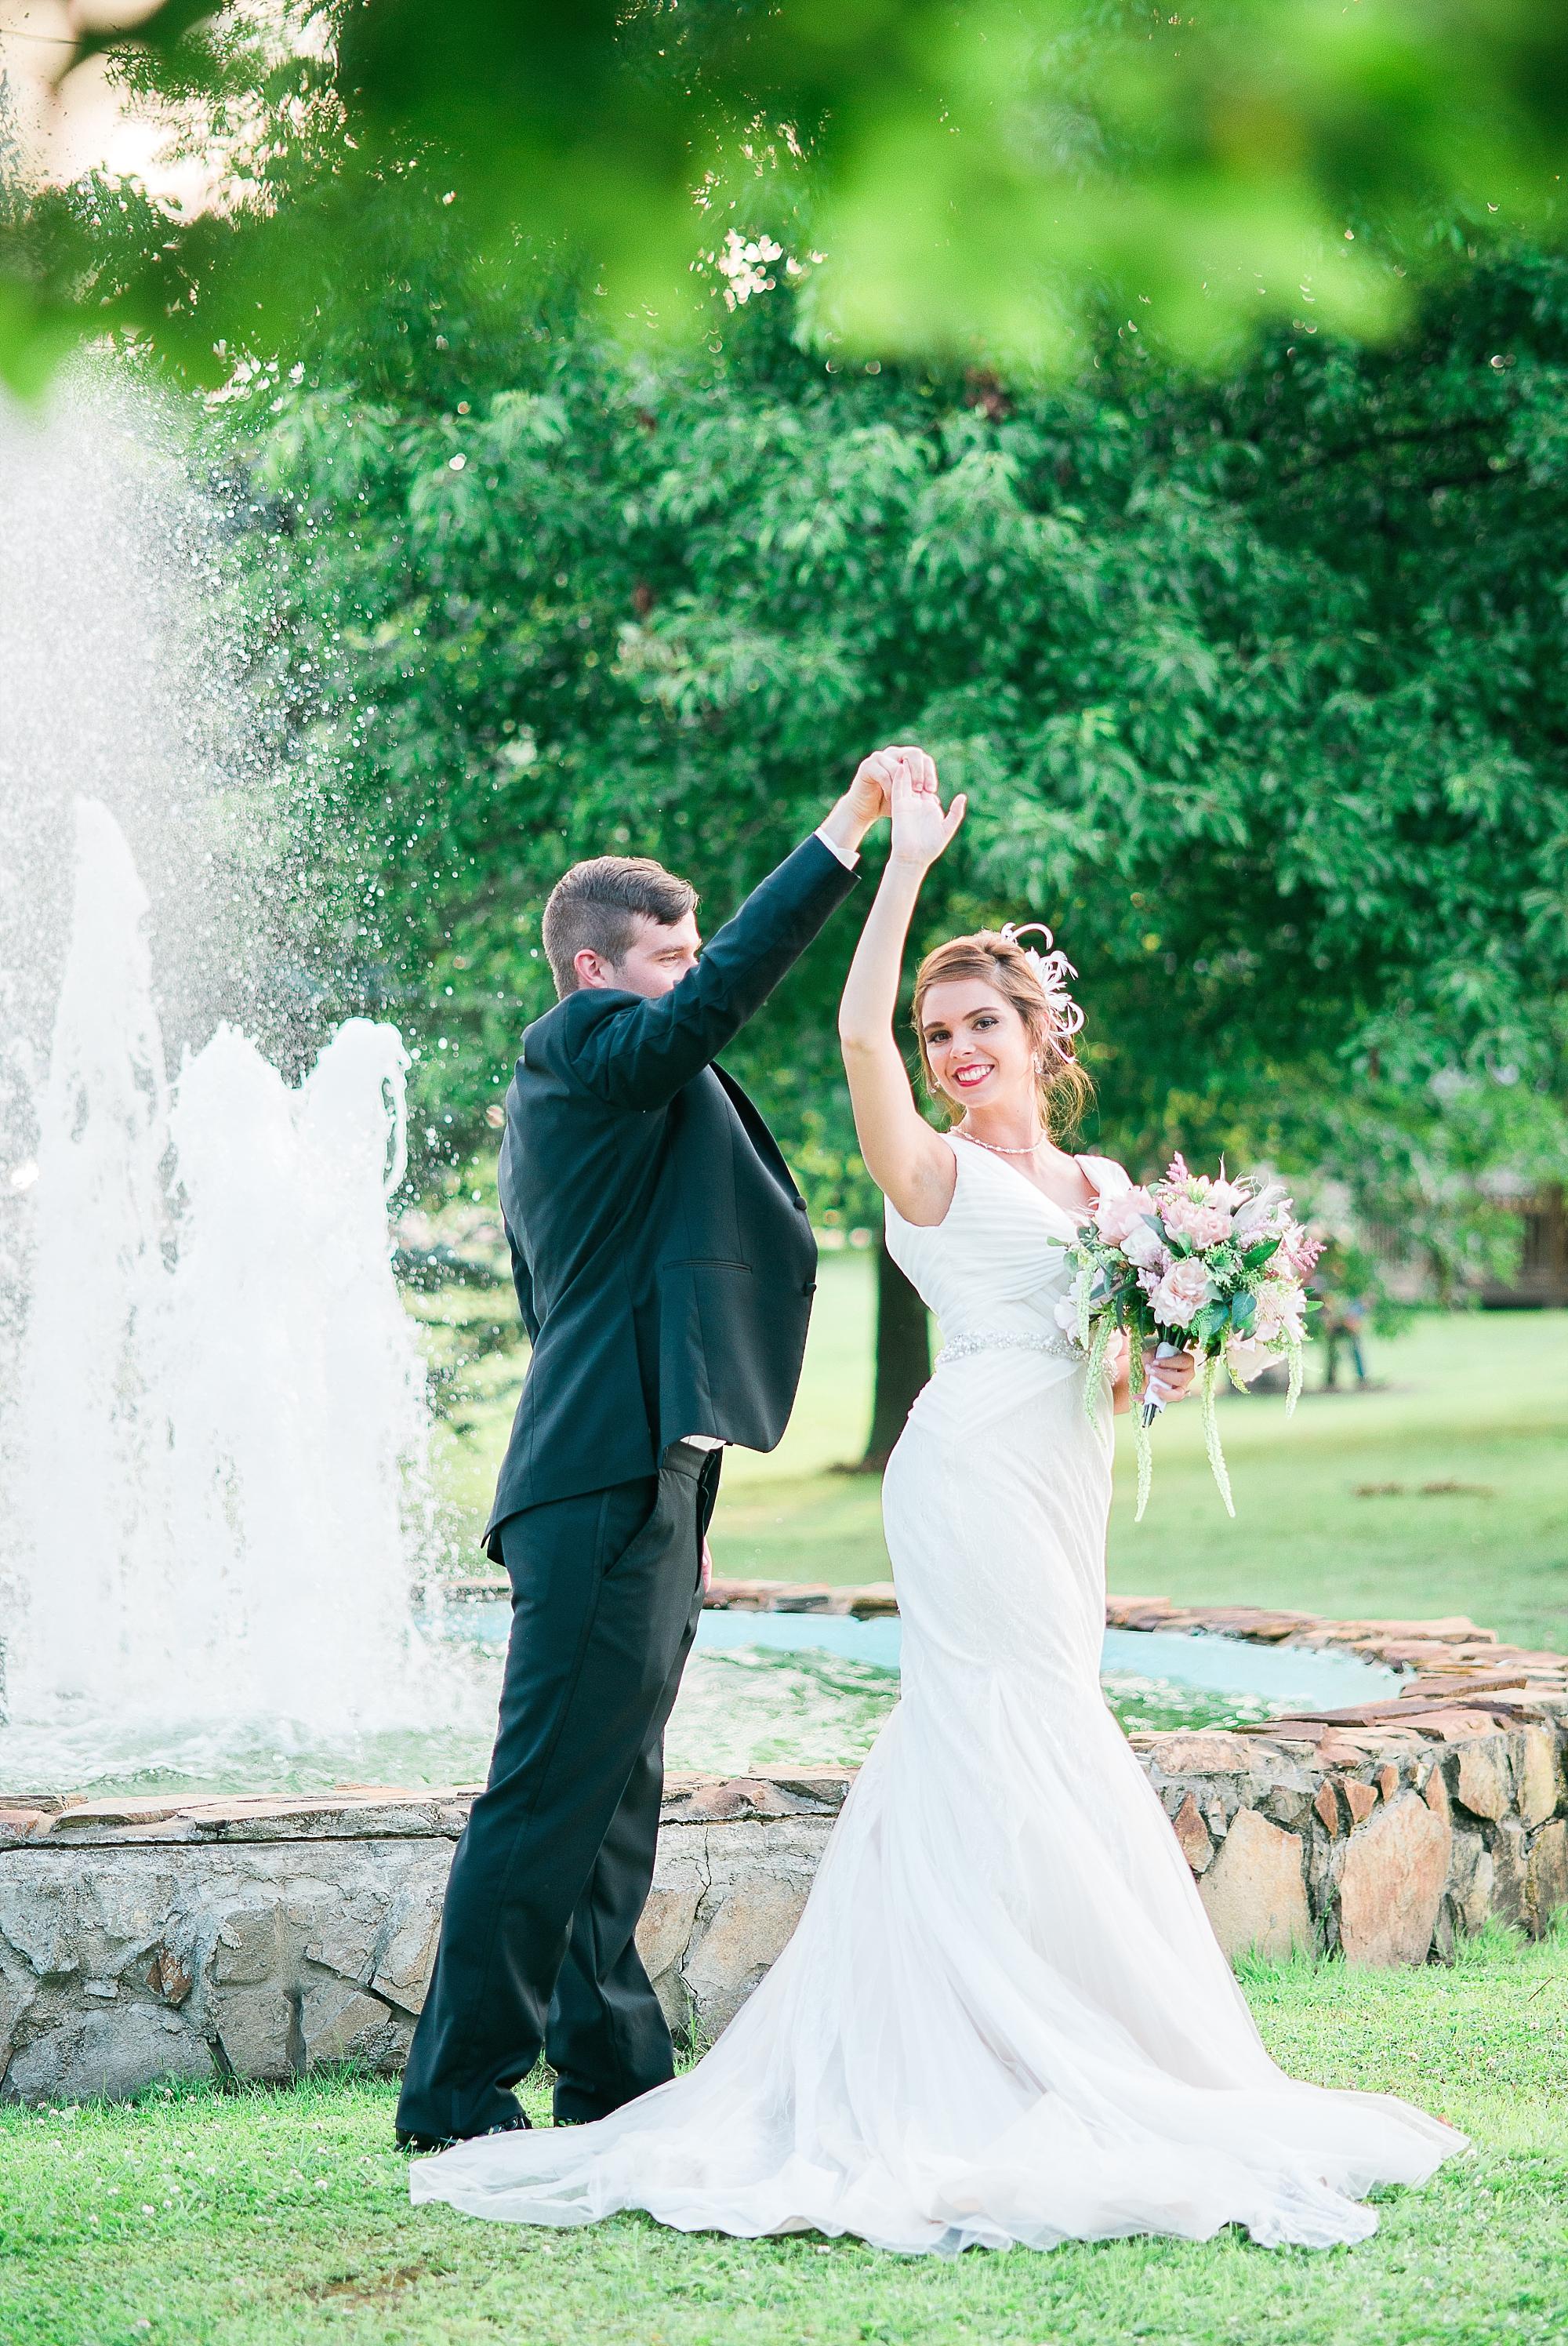 One Enchanted Evening wedding venue photography